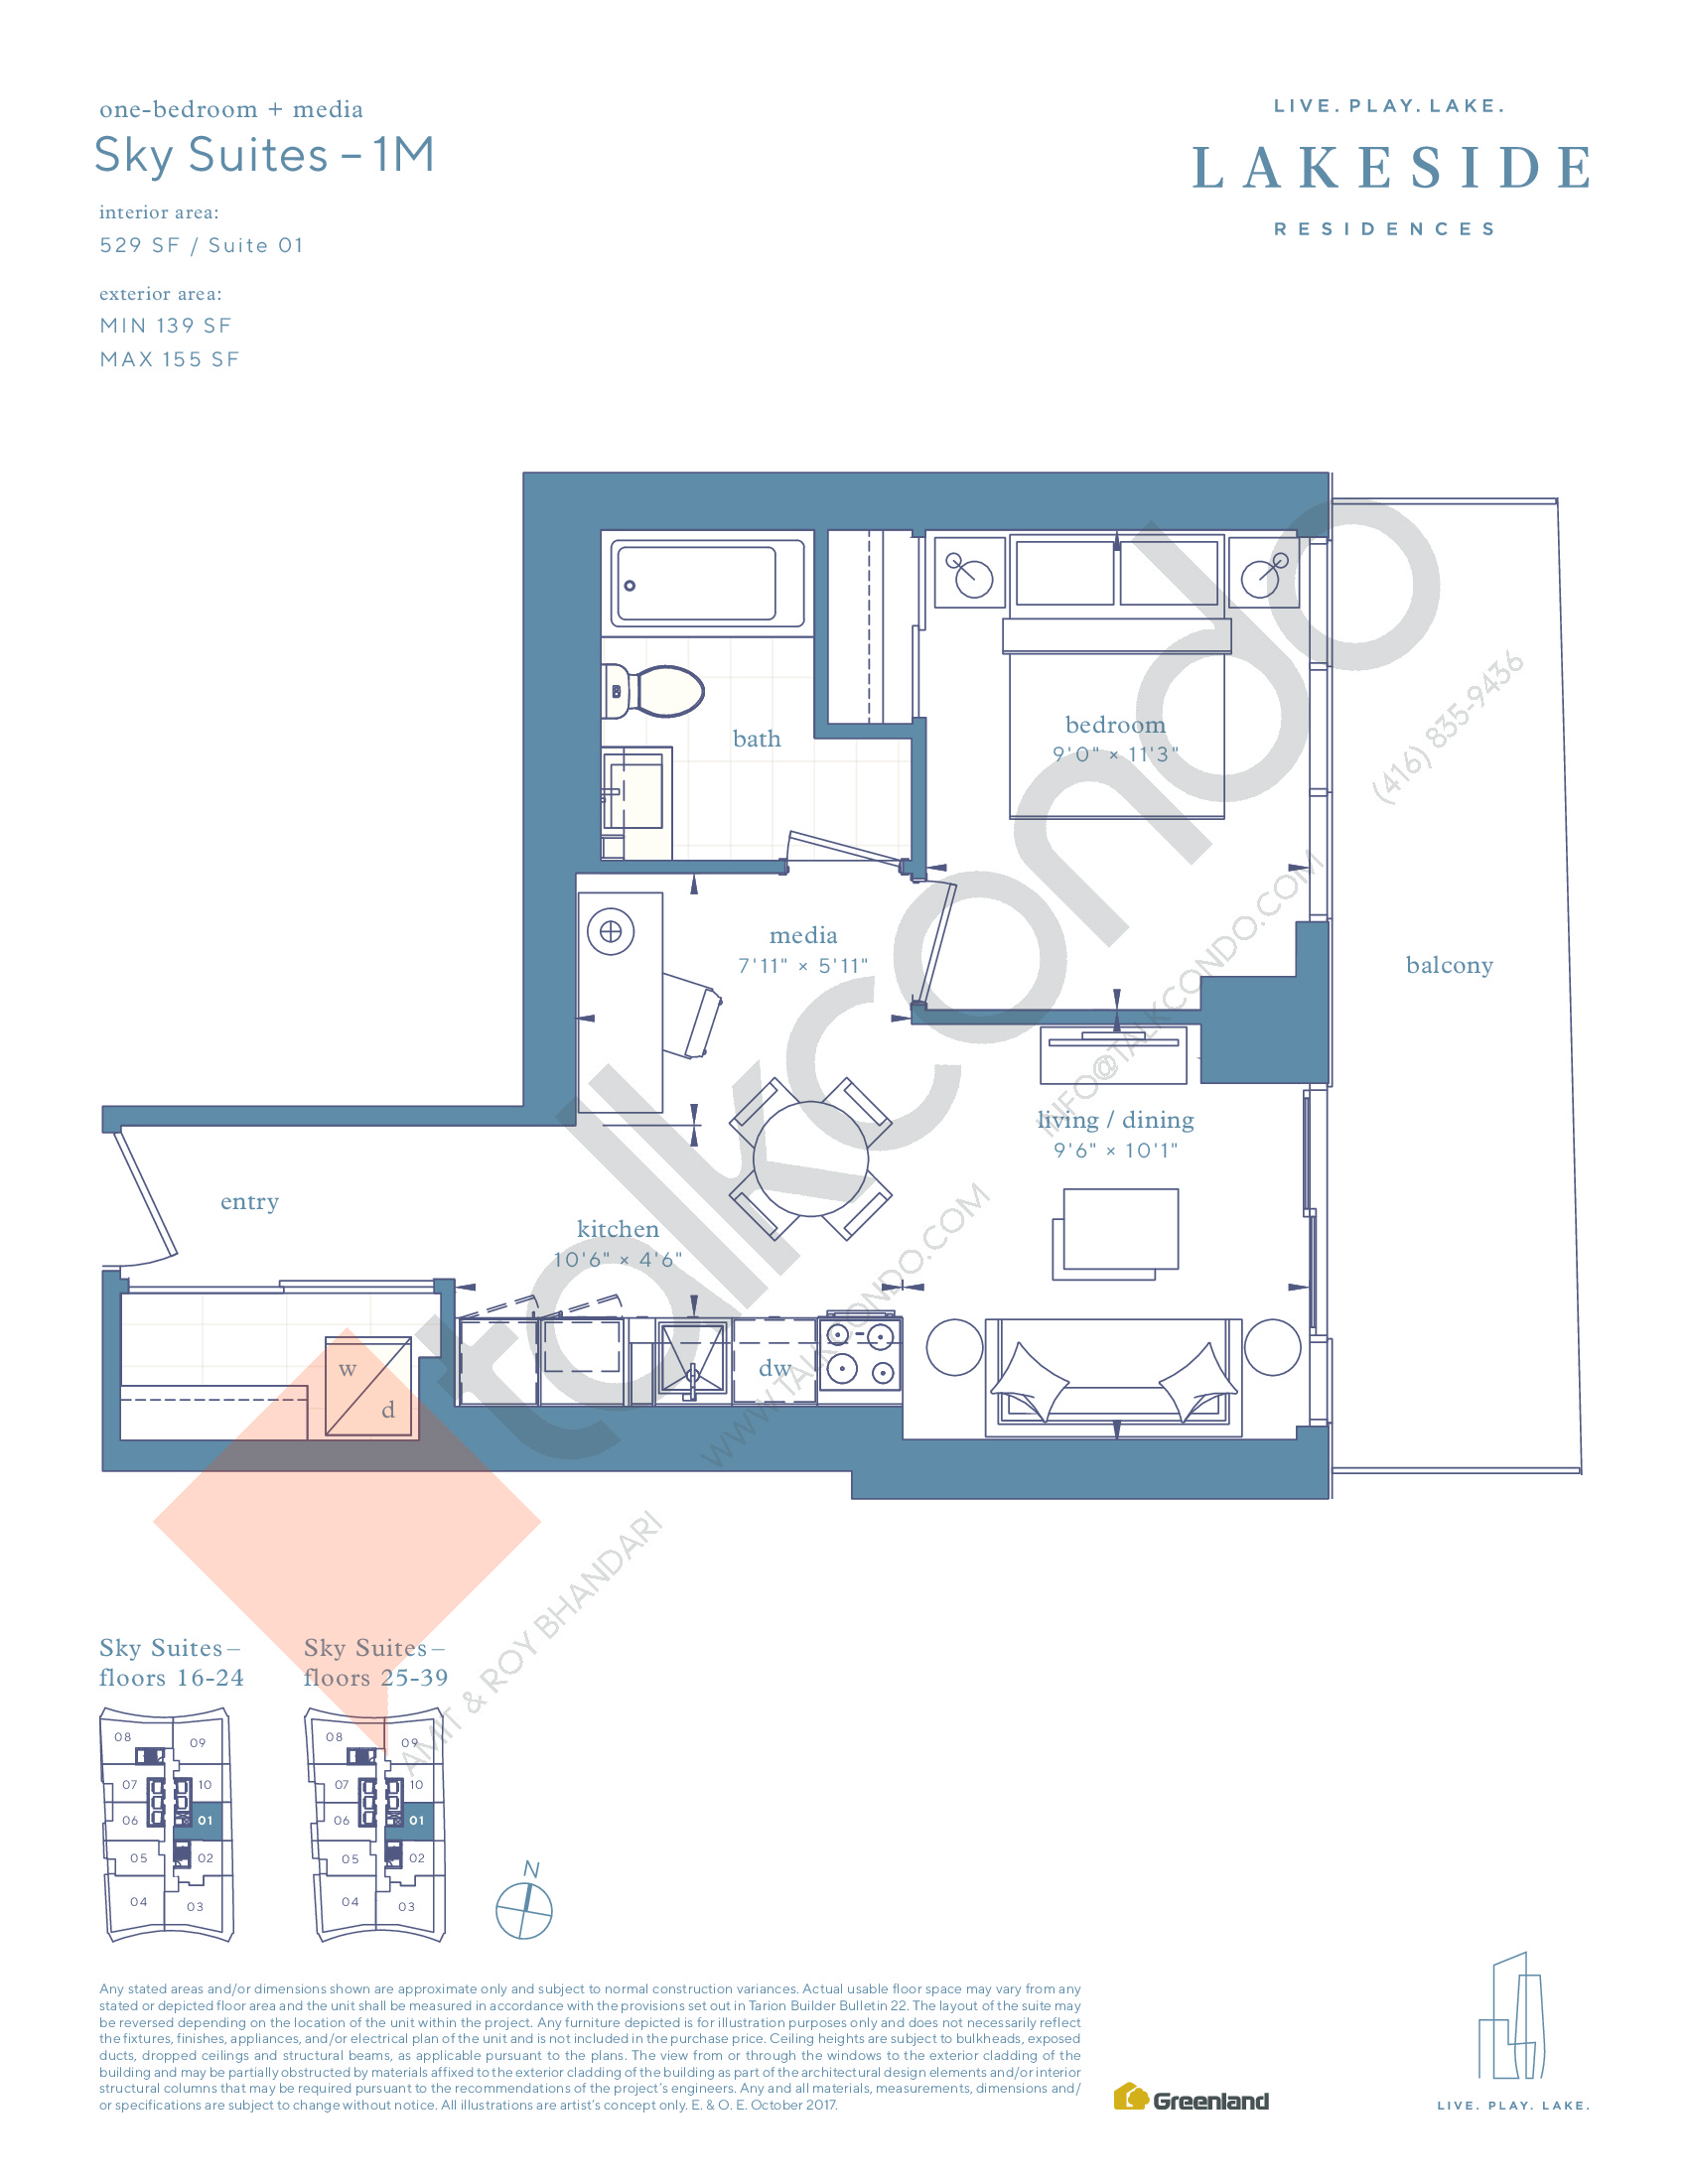 Sky Suites - 1M Floor Plan at Lakeside Residences - 529 sq.ft